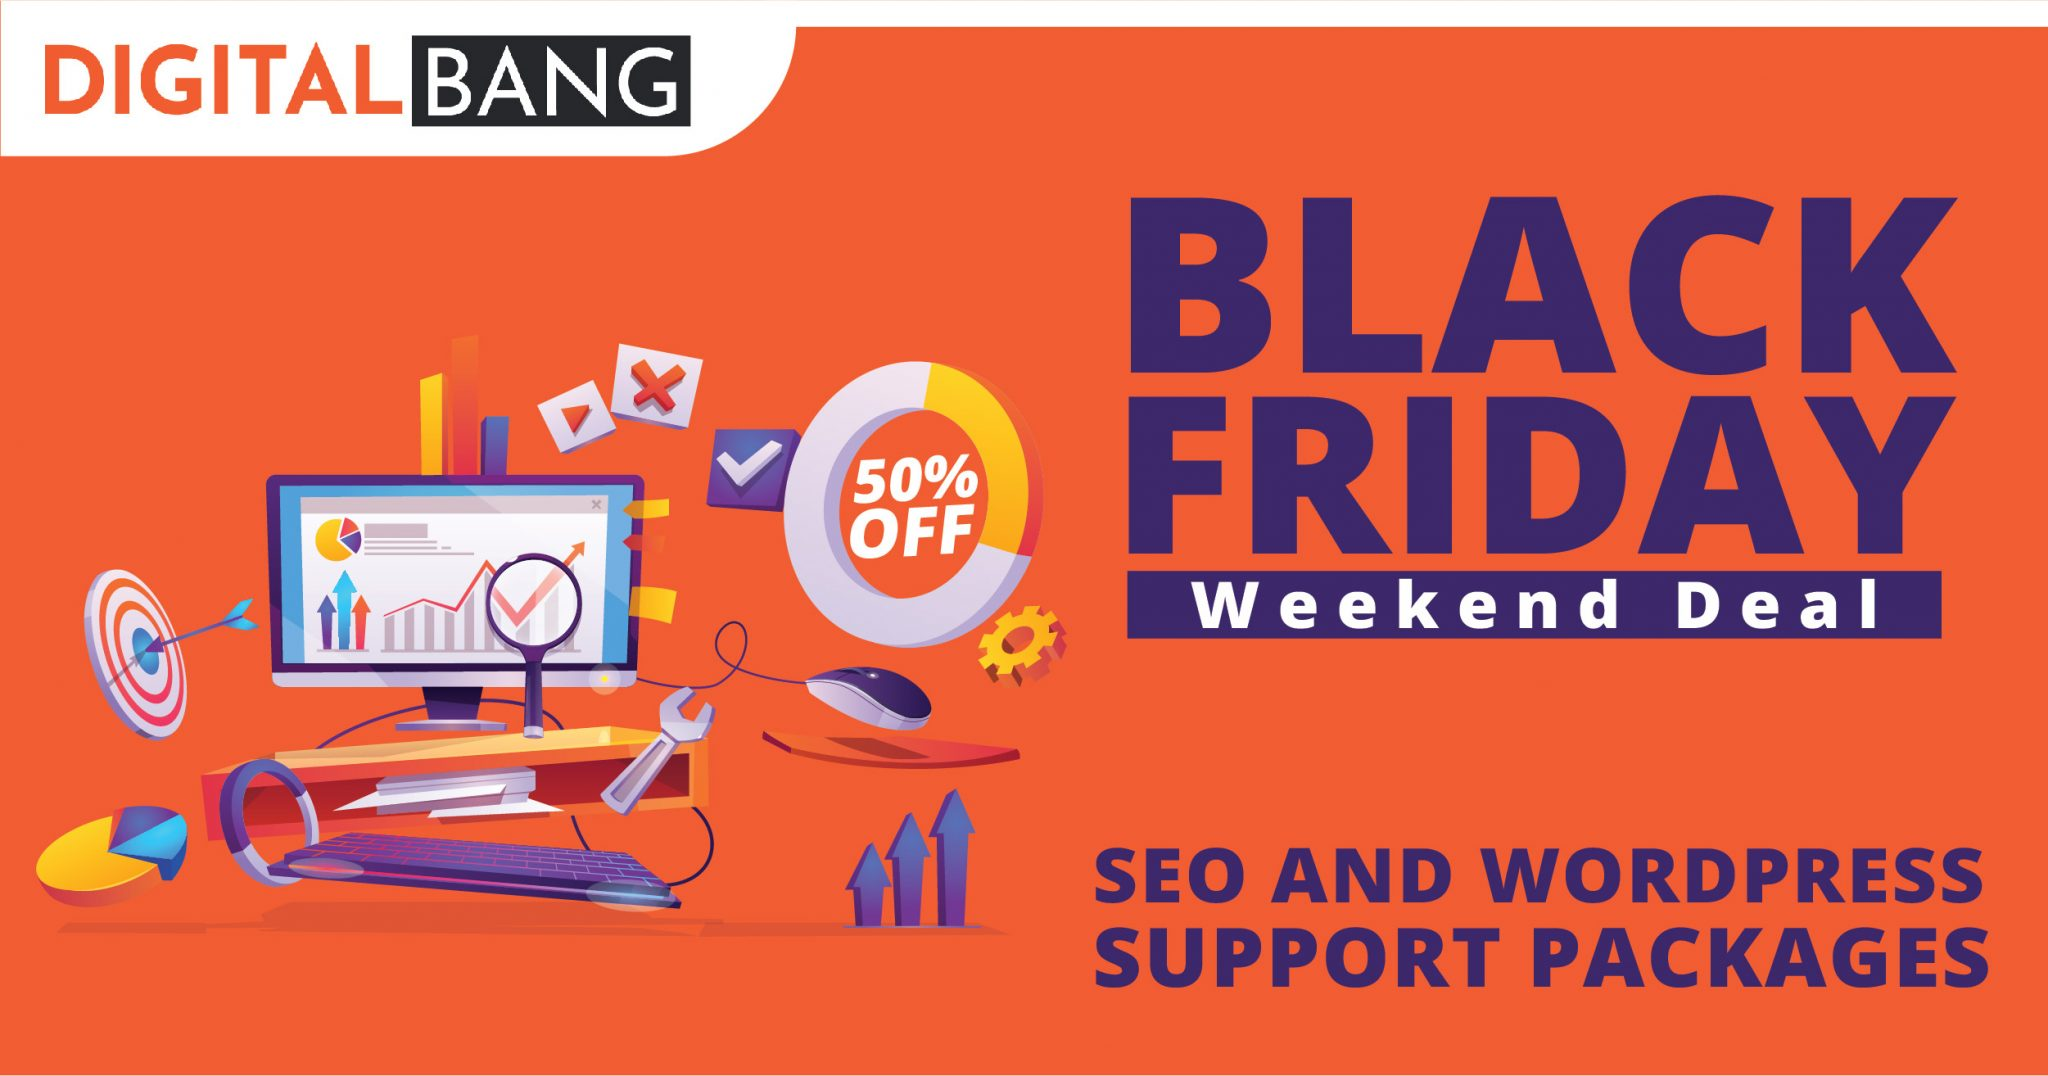 Black Friday Marketing Deals